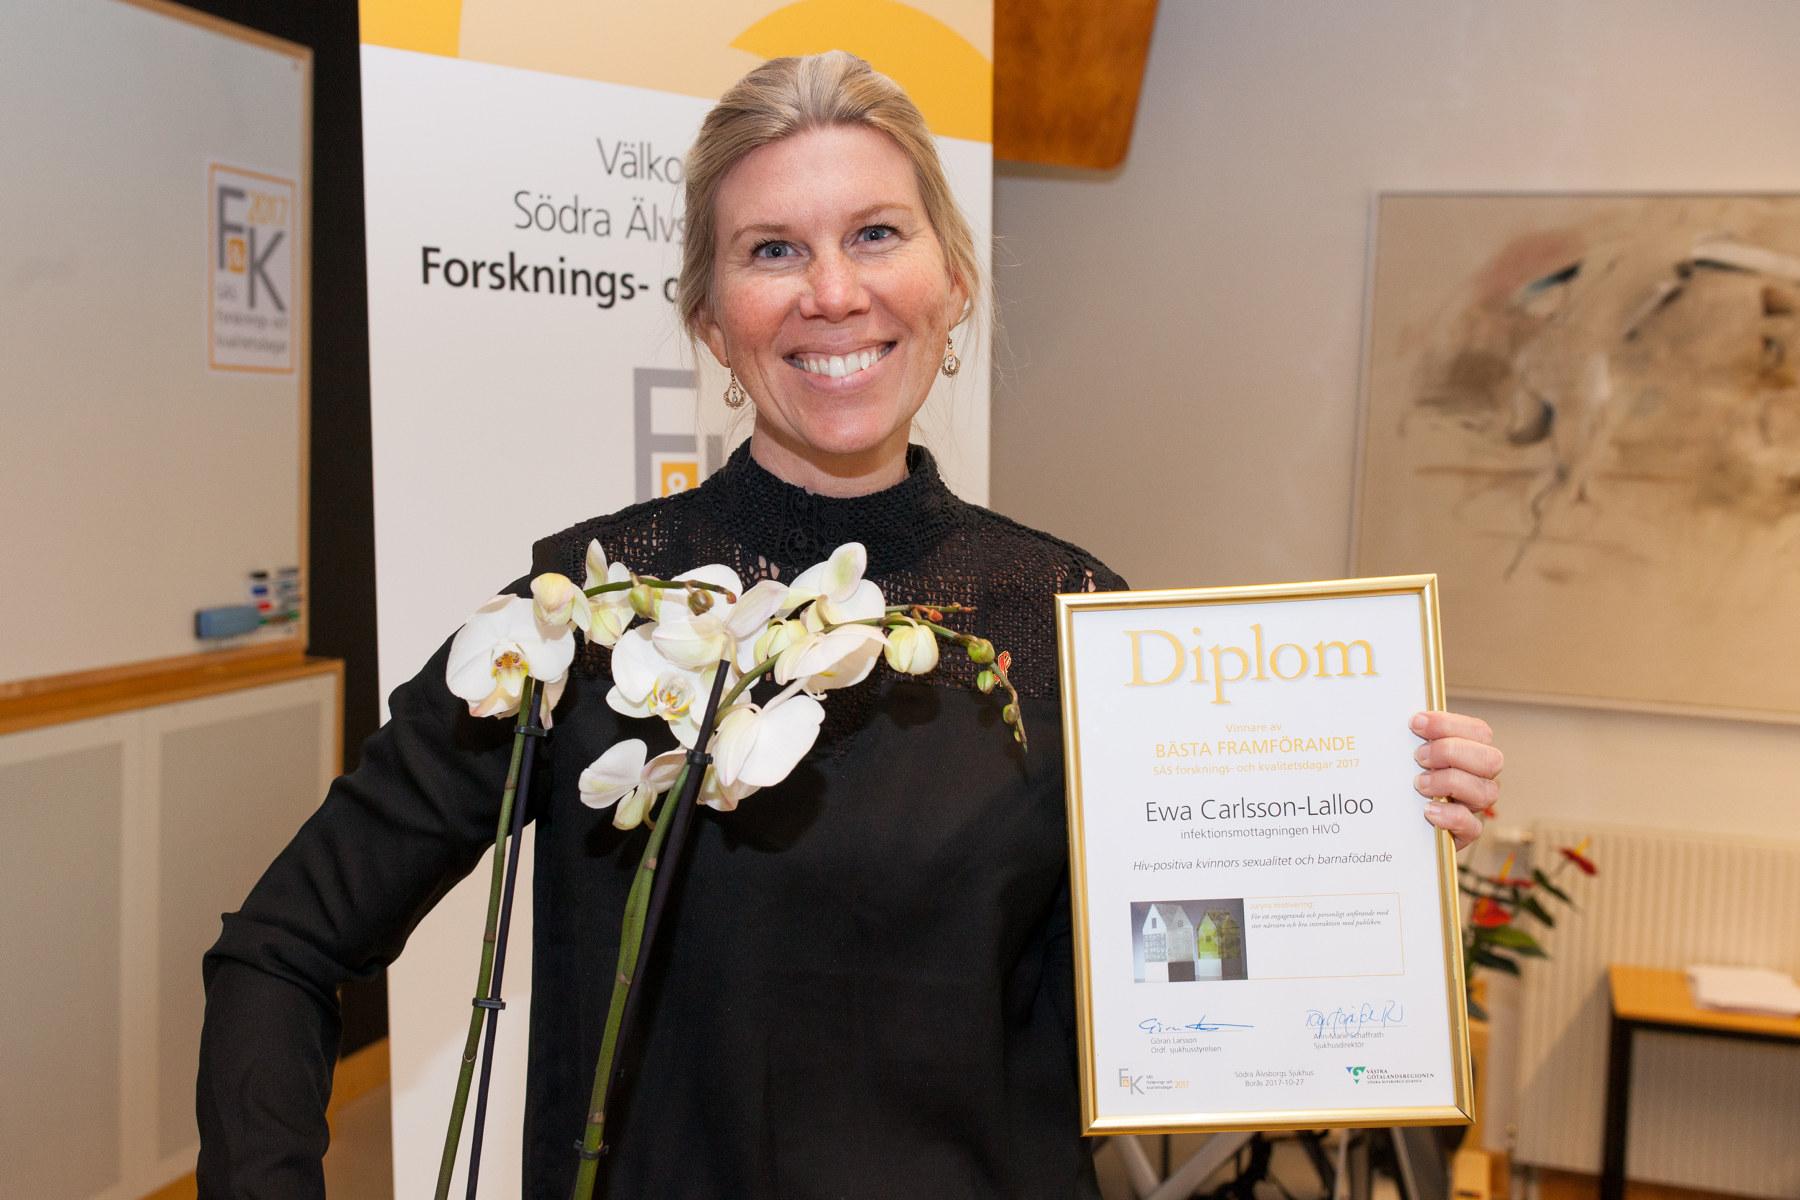 Ewa Carlsson